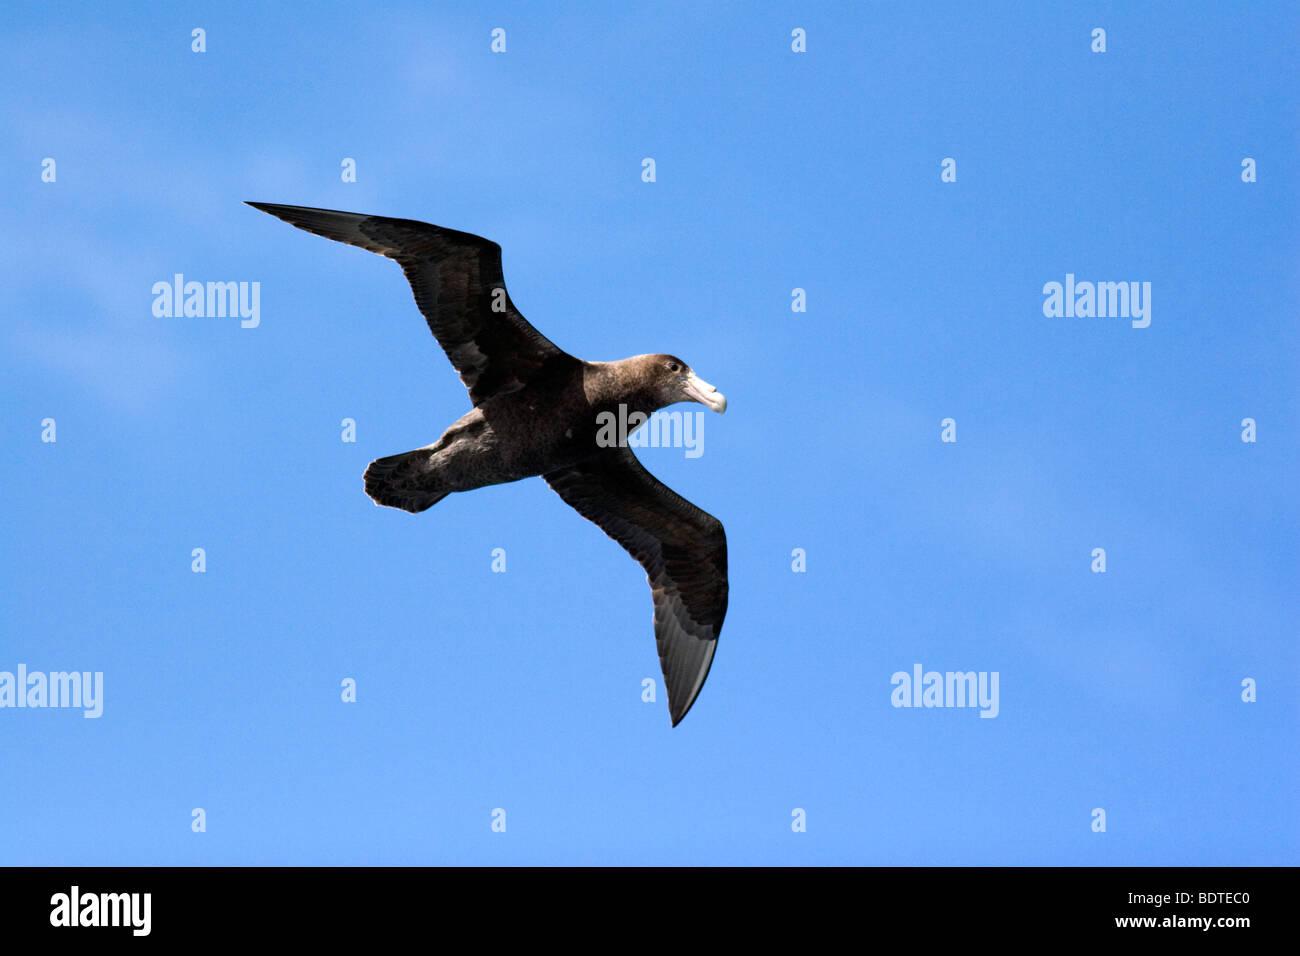 Juvenile Giant Petrel in flight near Cape Horn, Chile - Stock Image